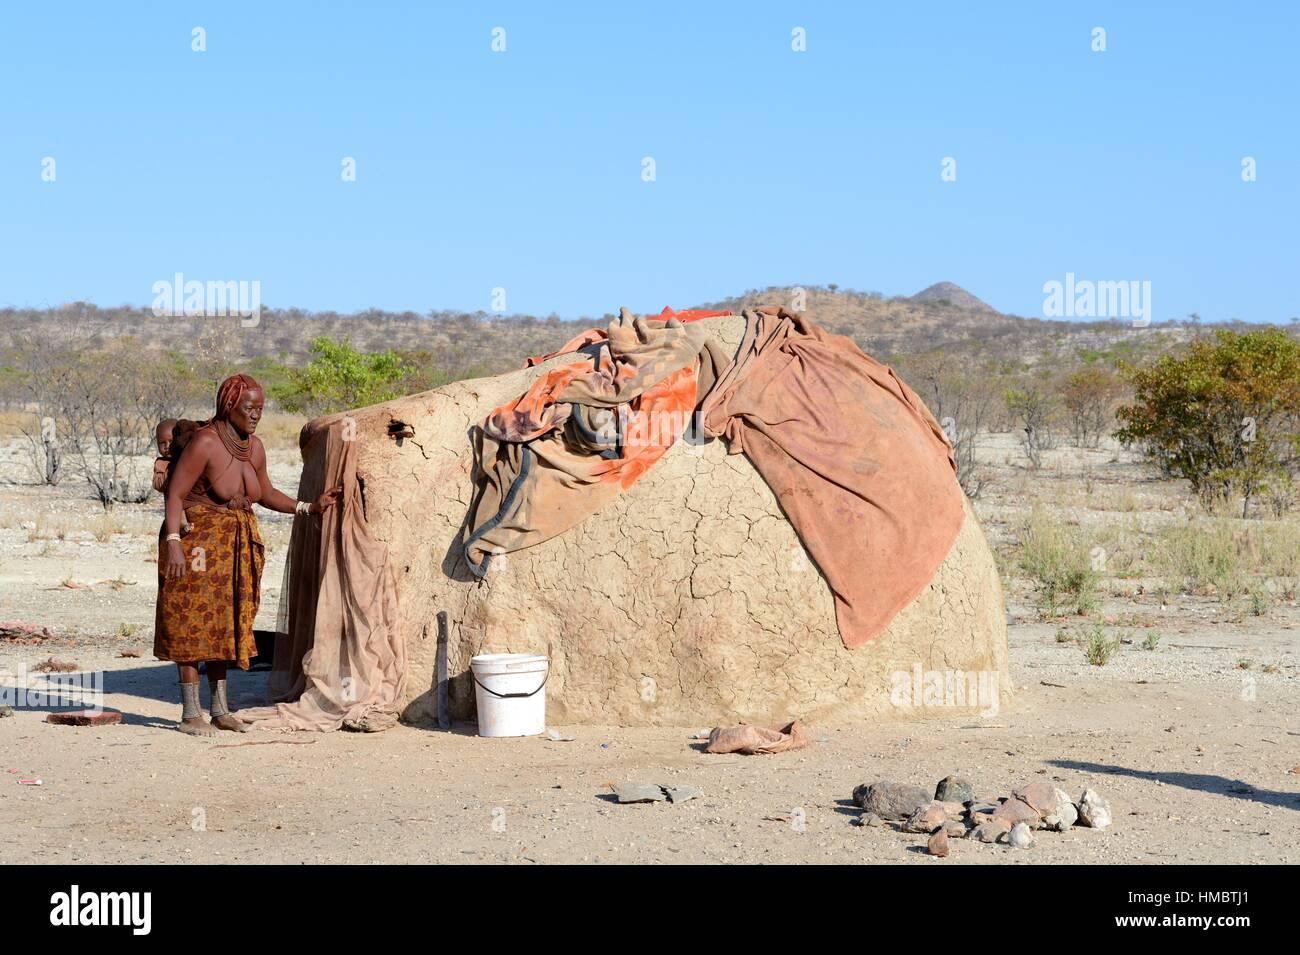 Mujer Himba junto al tradicional choza de barro. Kaokoland, Namibia. Imagen De Stock